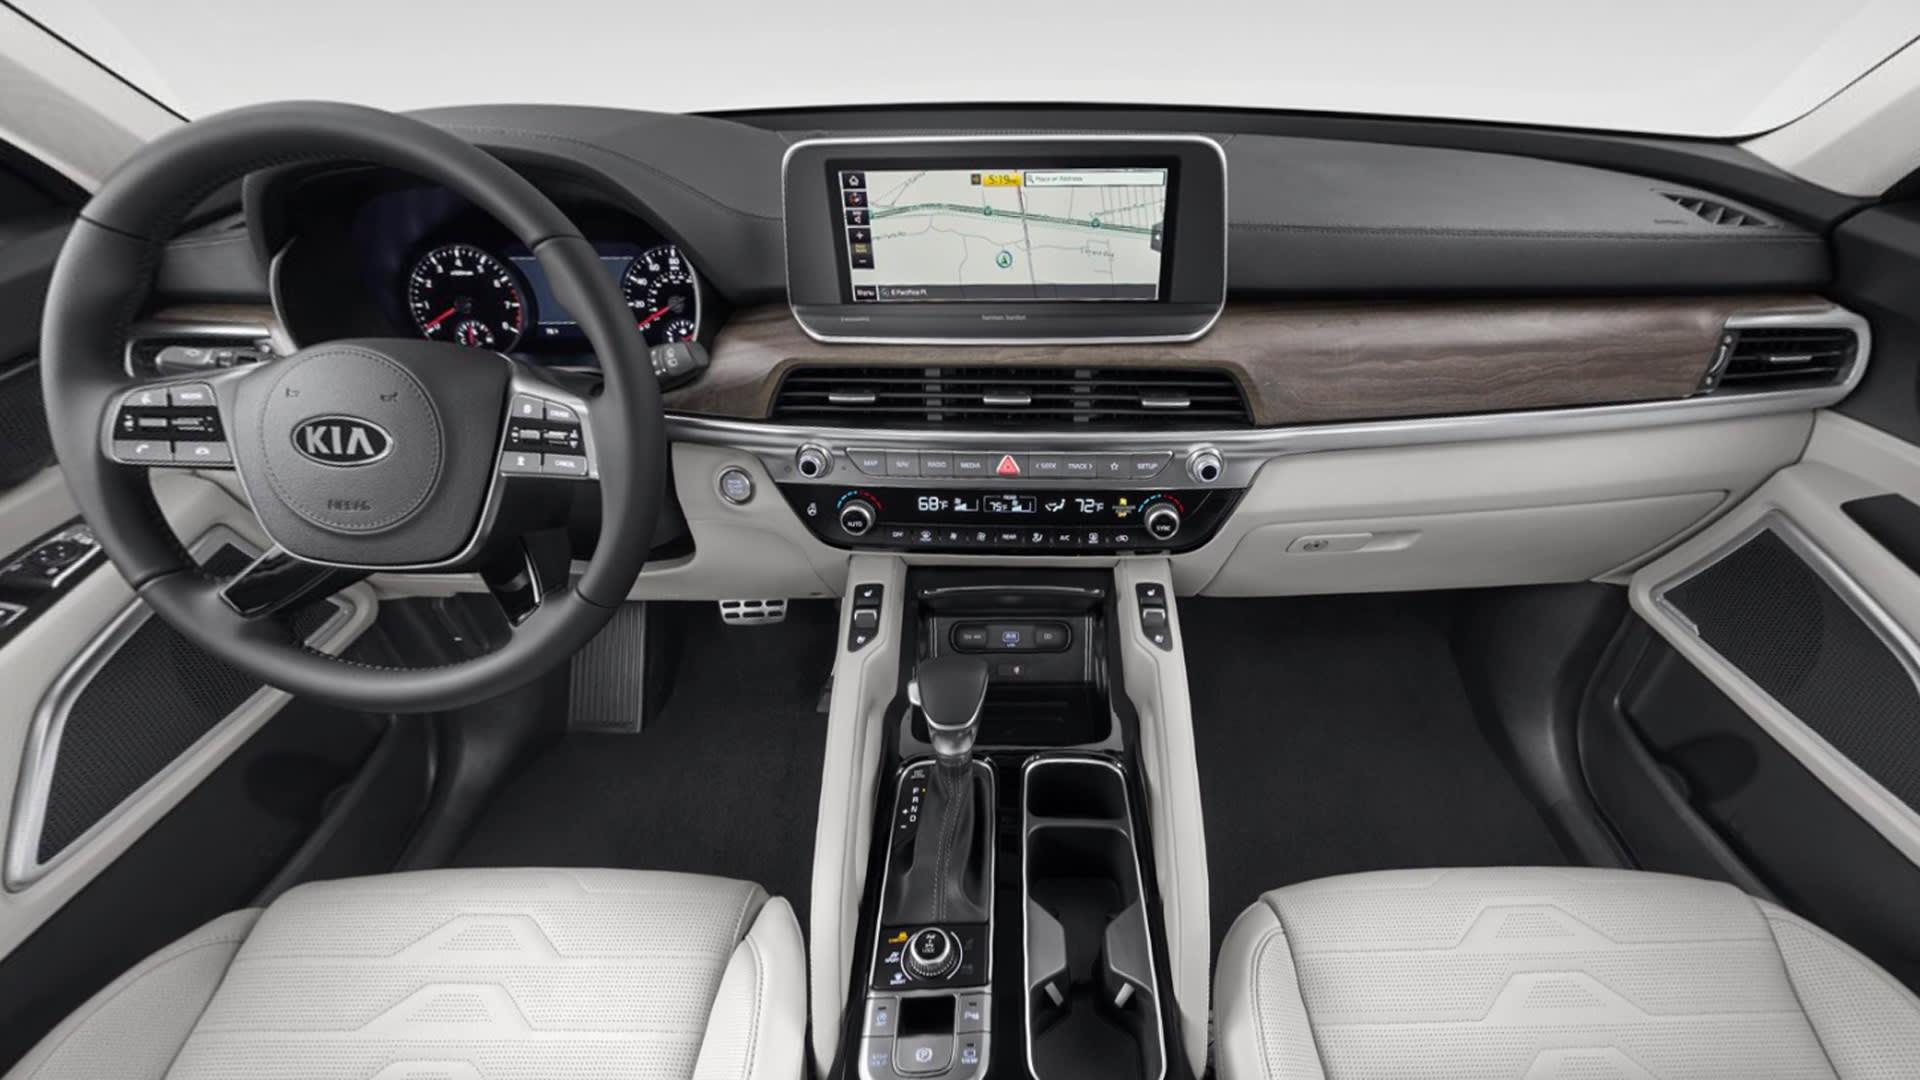 2020 Kia Telluride First Drive Review